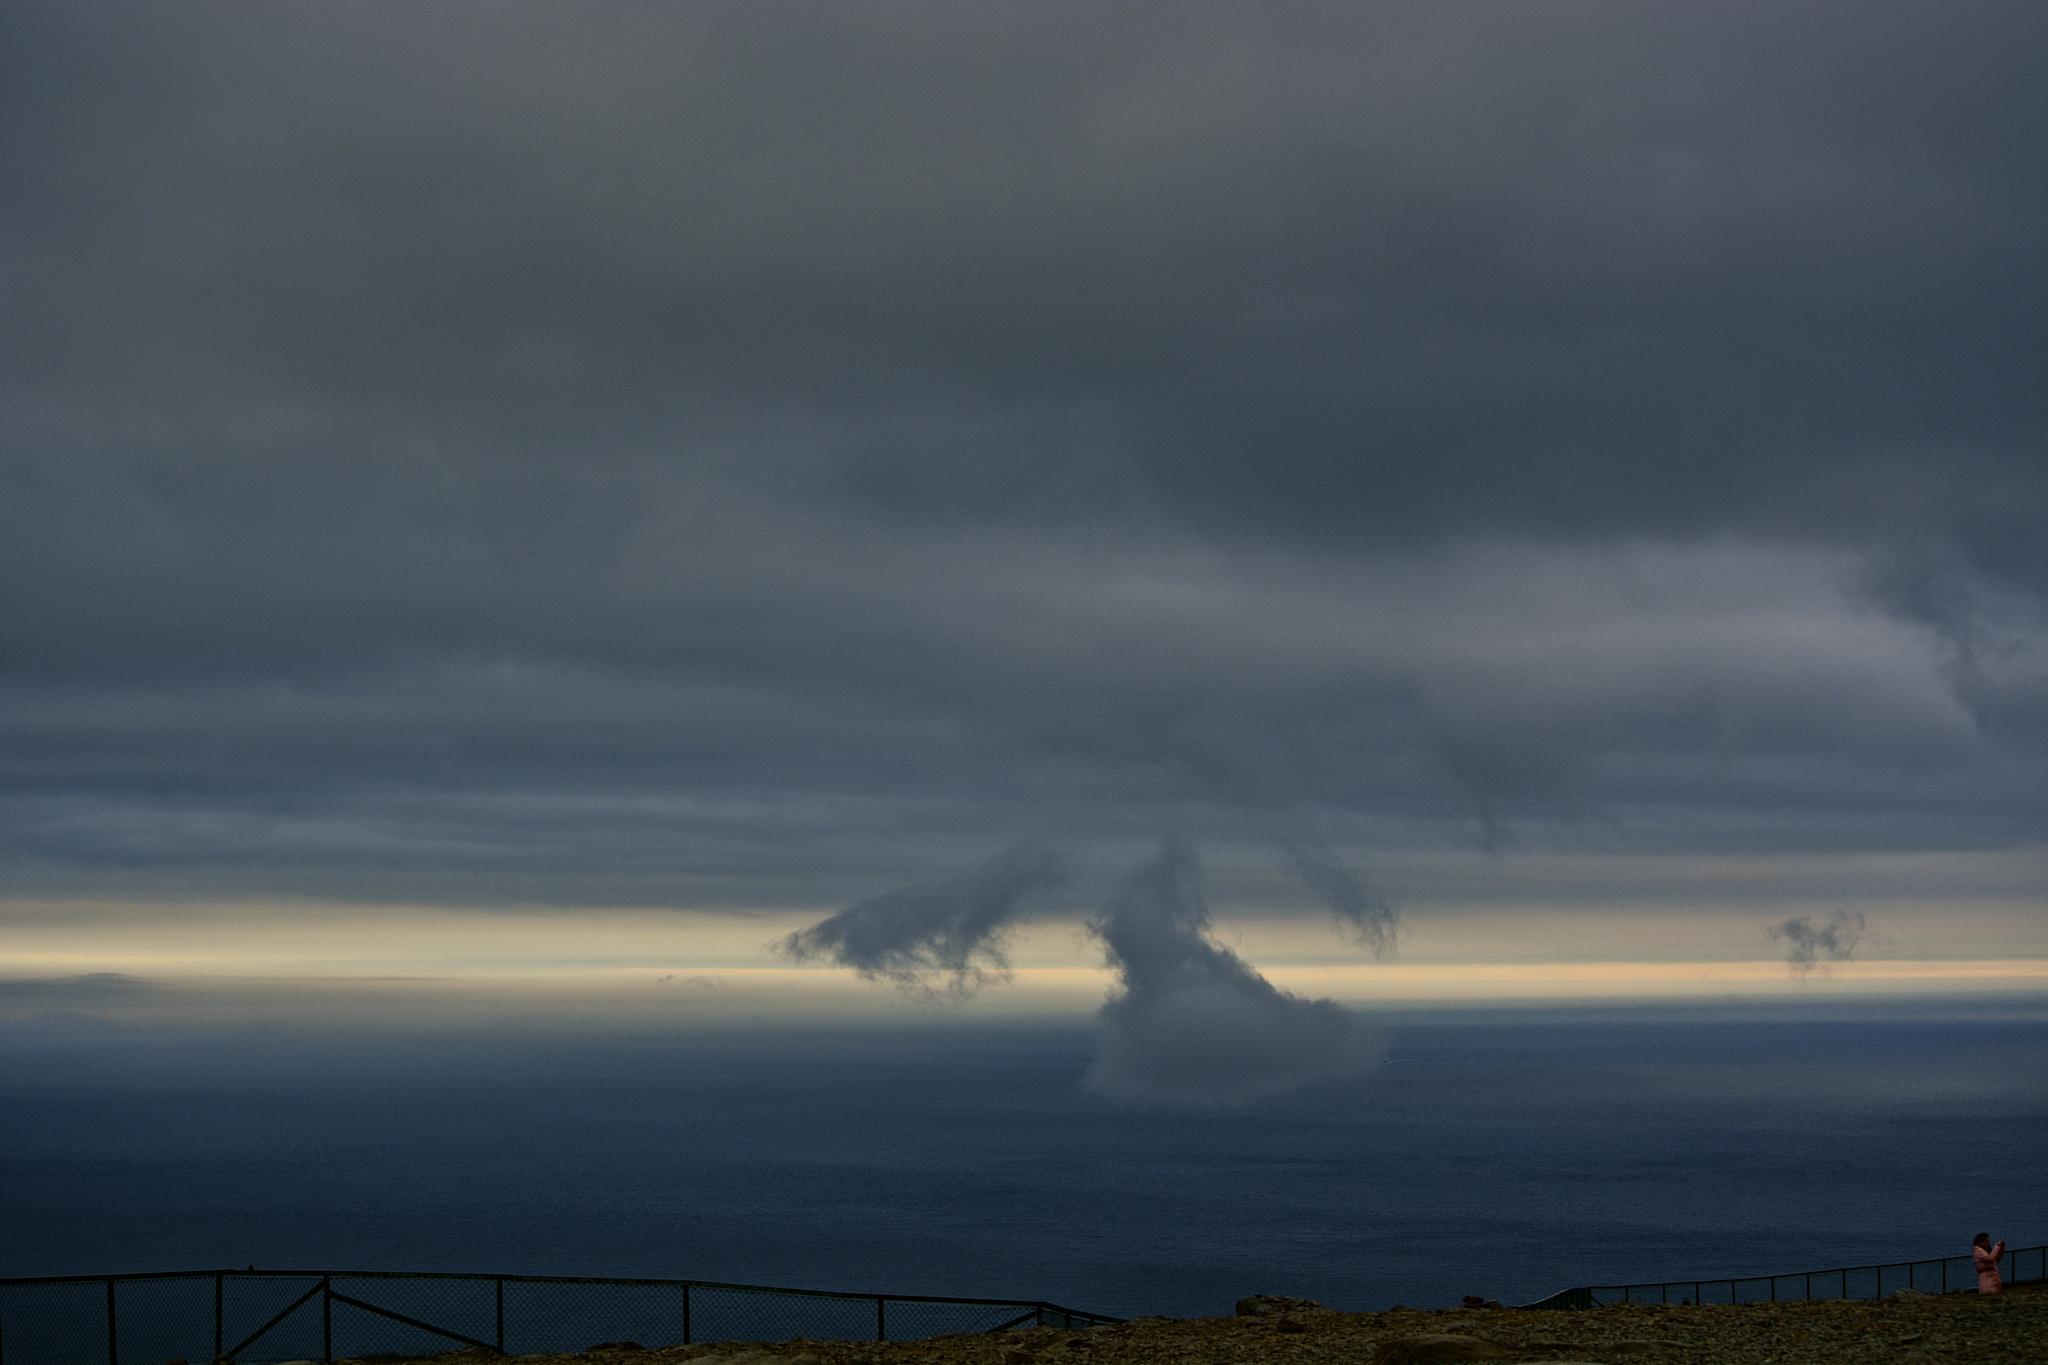 A cloud resembles an engel <3 by jurate.elnef